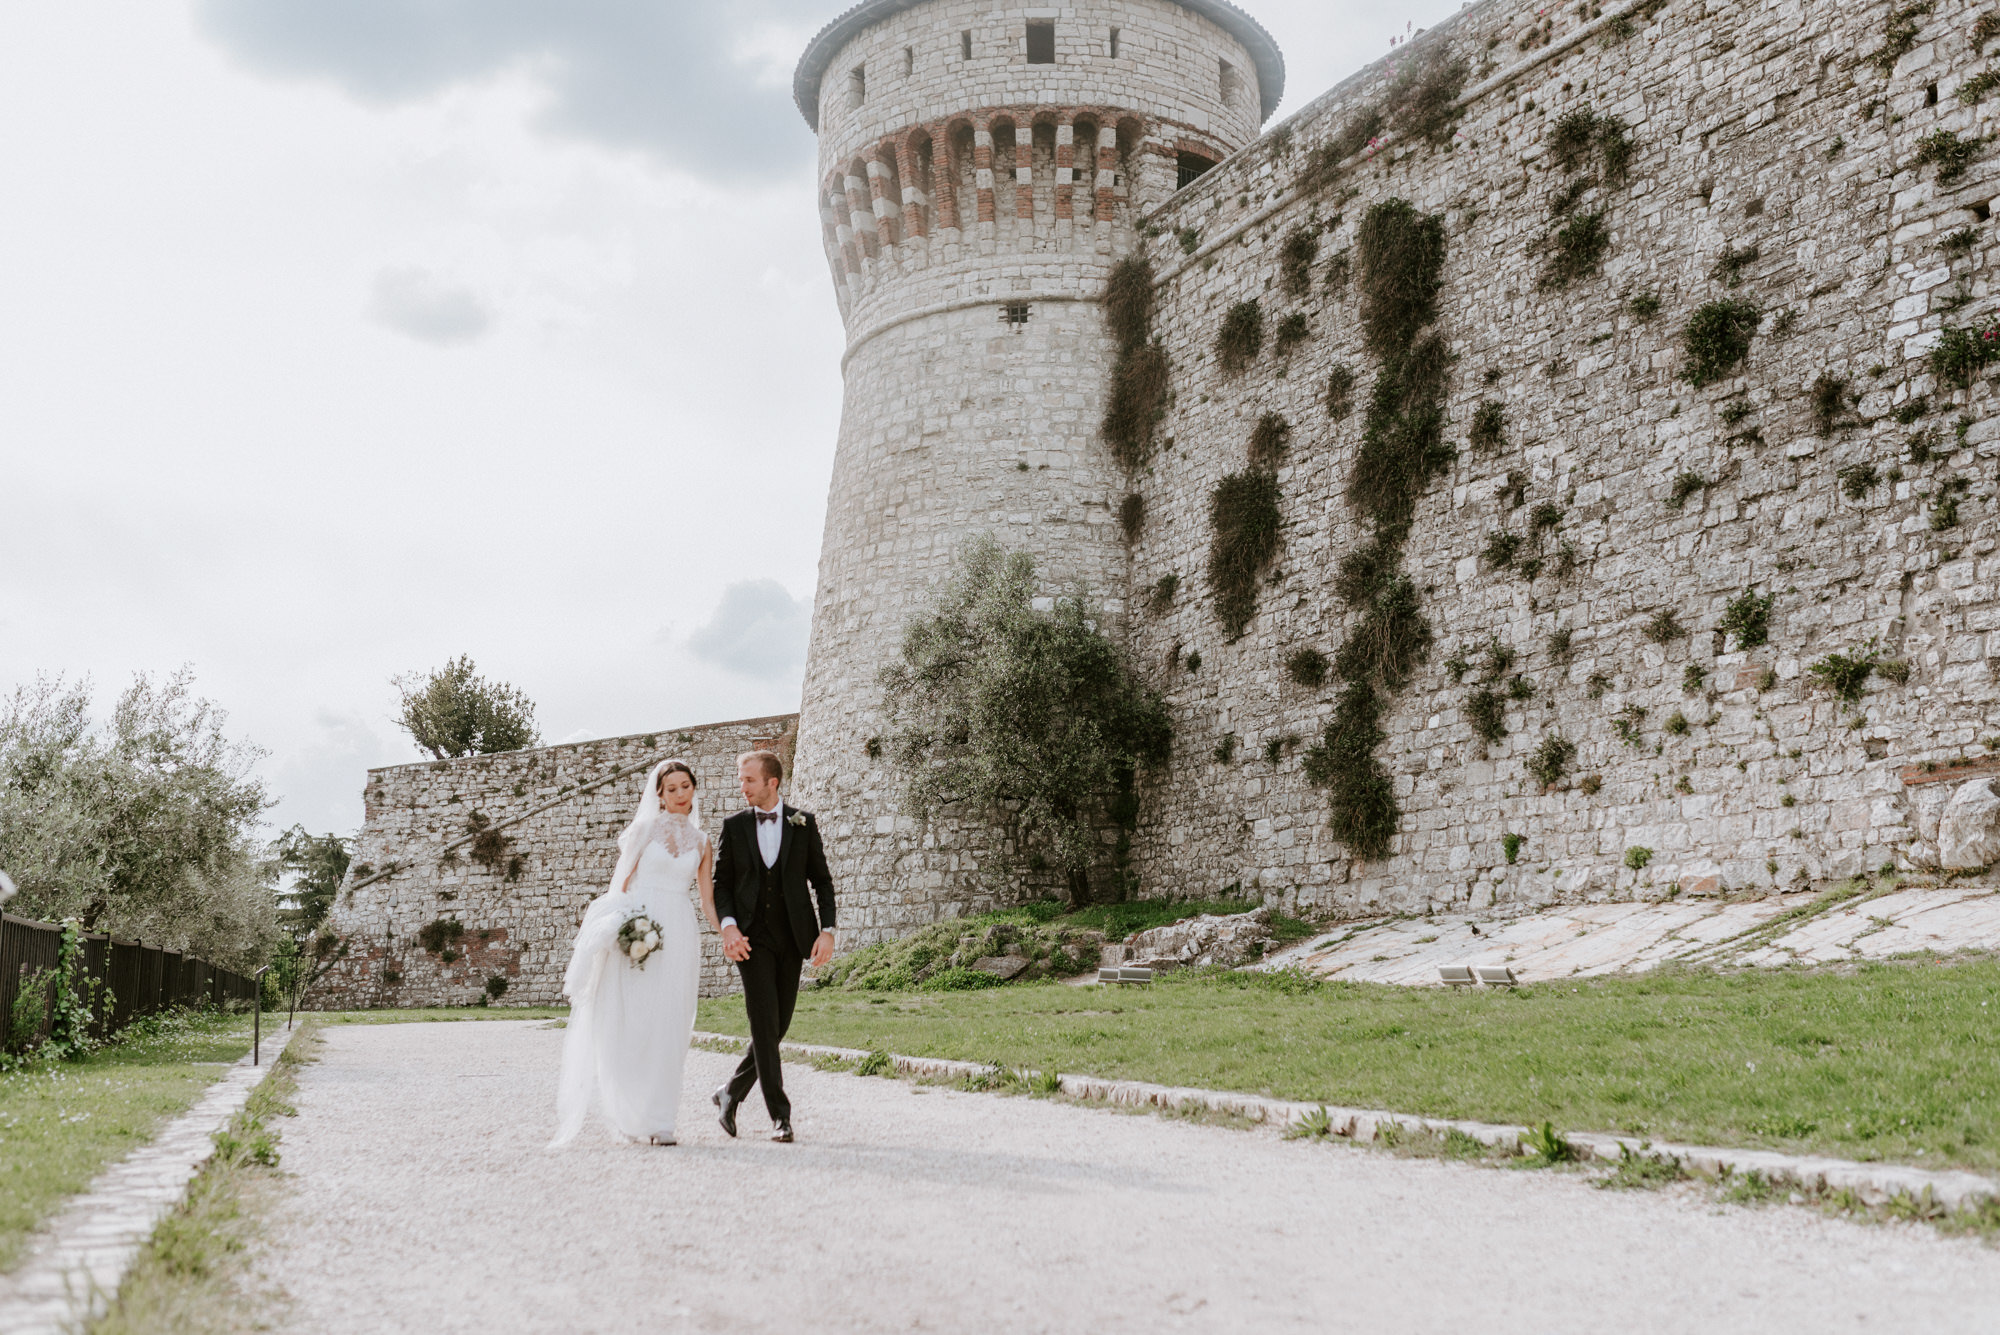 FOTO+PHOTO+BODA+WEDDING+ITALIA+ITALY+MAURICIO+GARAY+MAURICIOGARAY+WEDDINPHOTOGRAPHER+FOTOGRAFODEBODA-1269.jpg